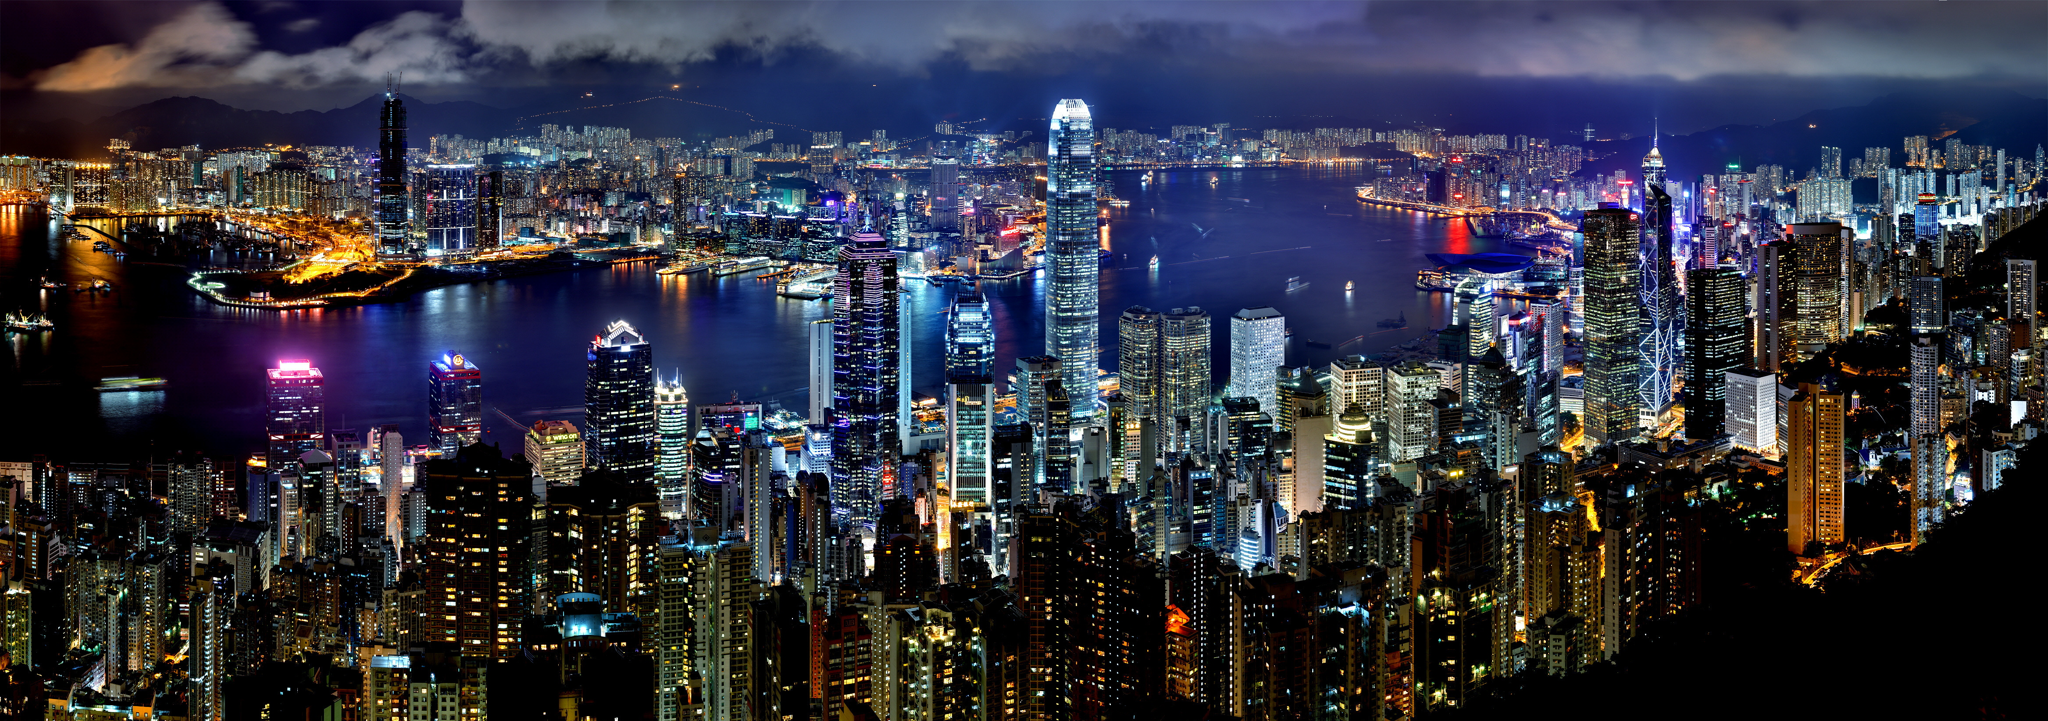 Hong Kong Escort - Hong Kong